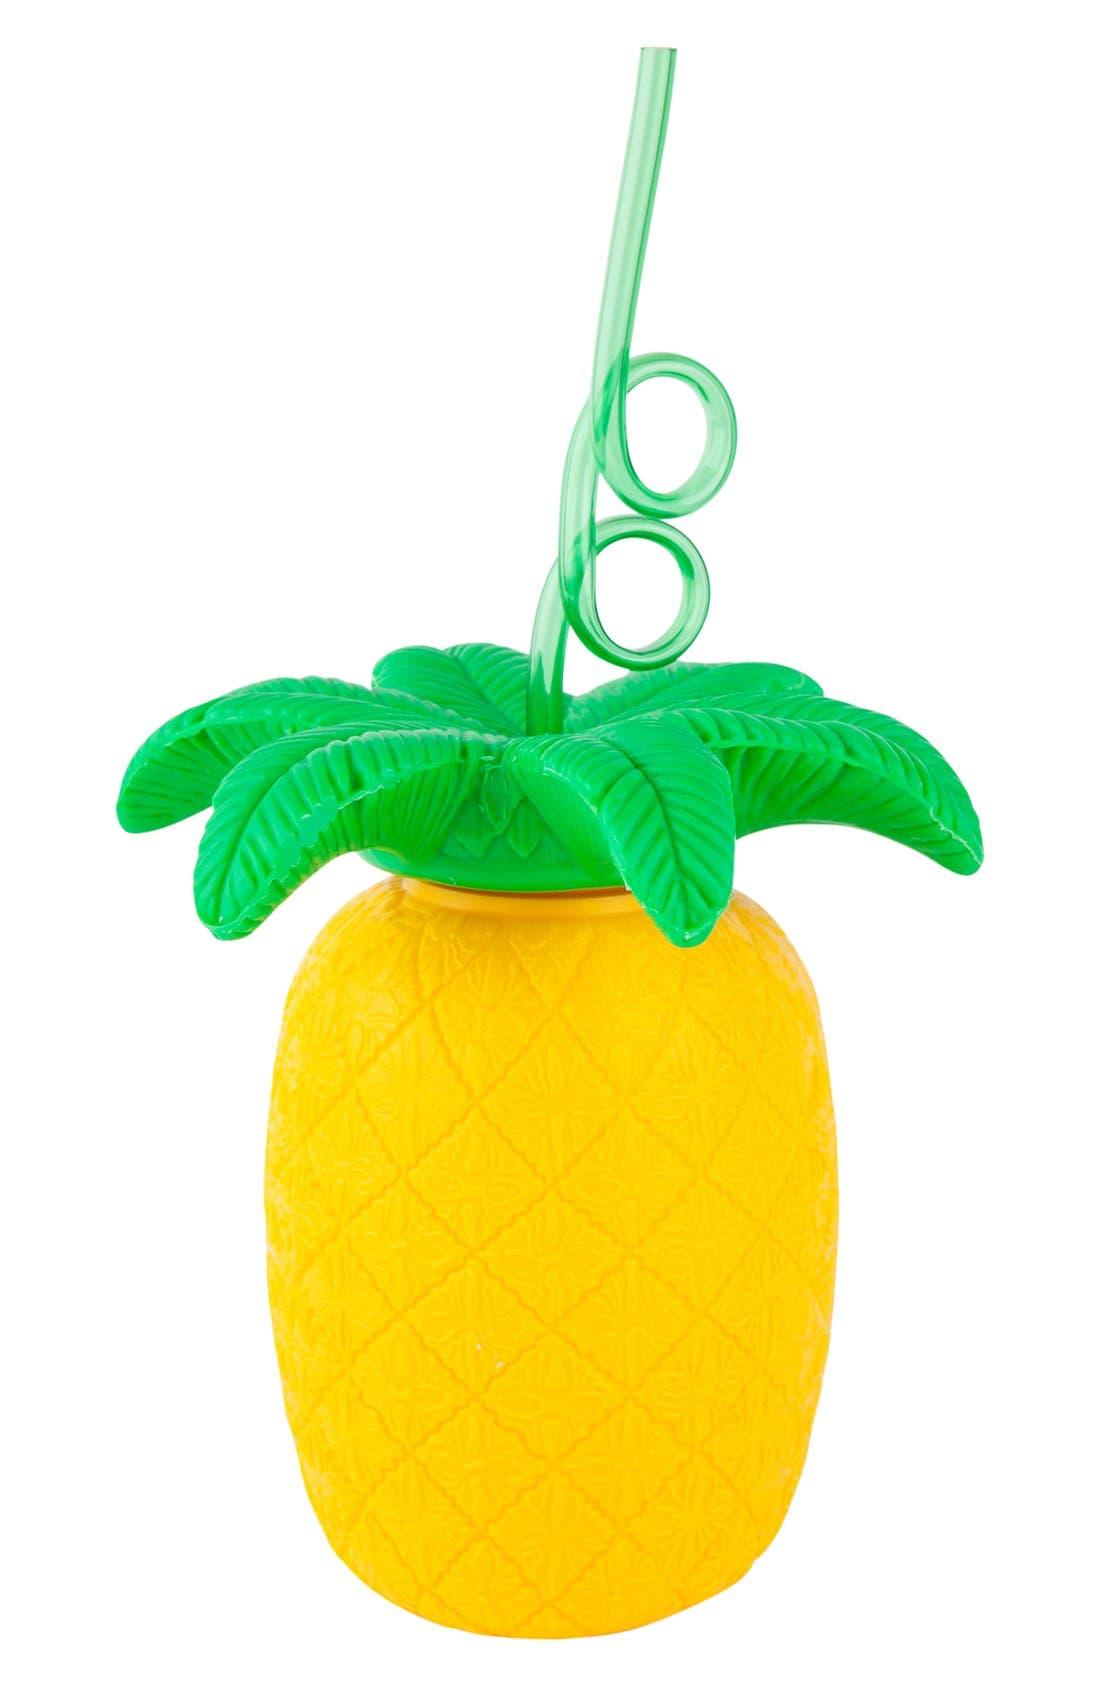 Main Image - Sunnylife Pineapple Cup & Straw